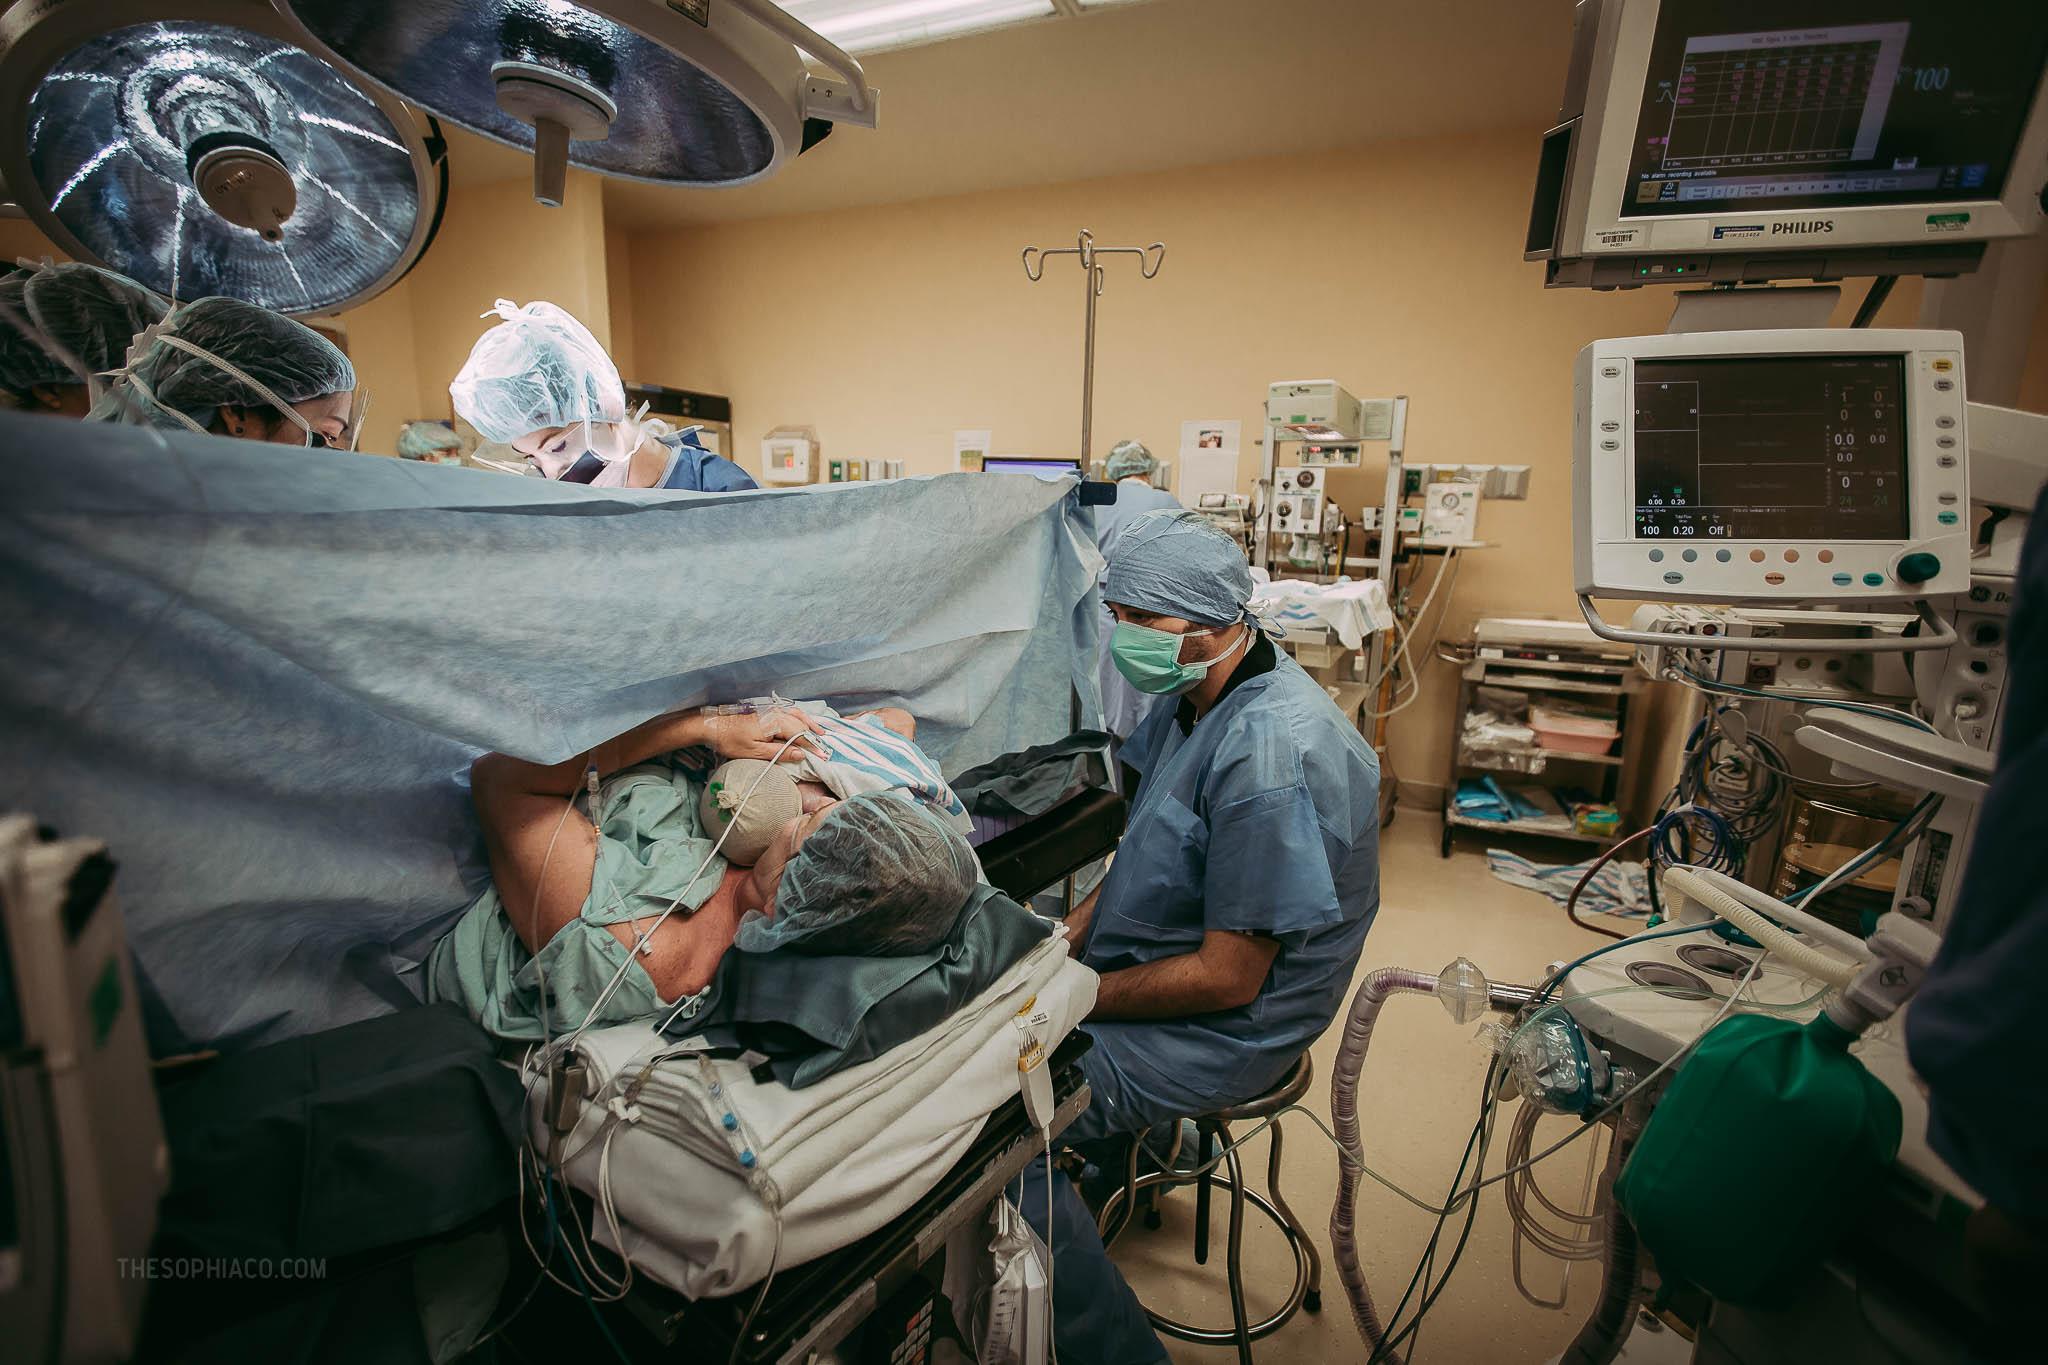 Oahu-Birth-Photographer-scheduled-cesarean-kaiser-24.jpg